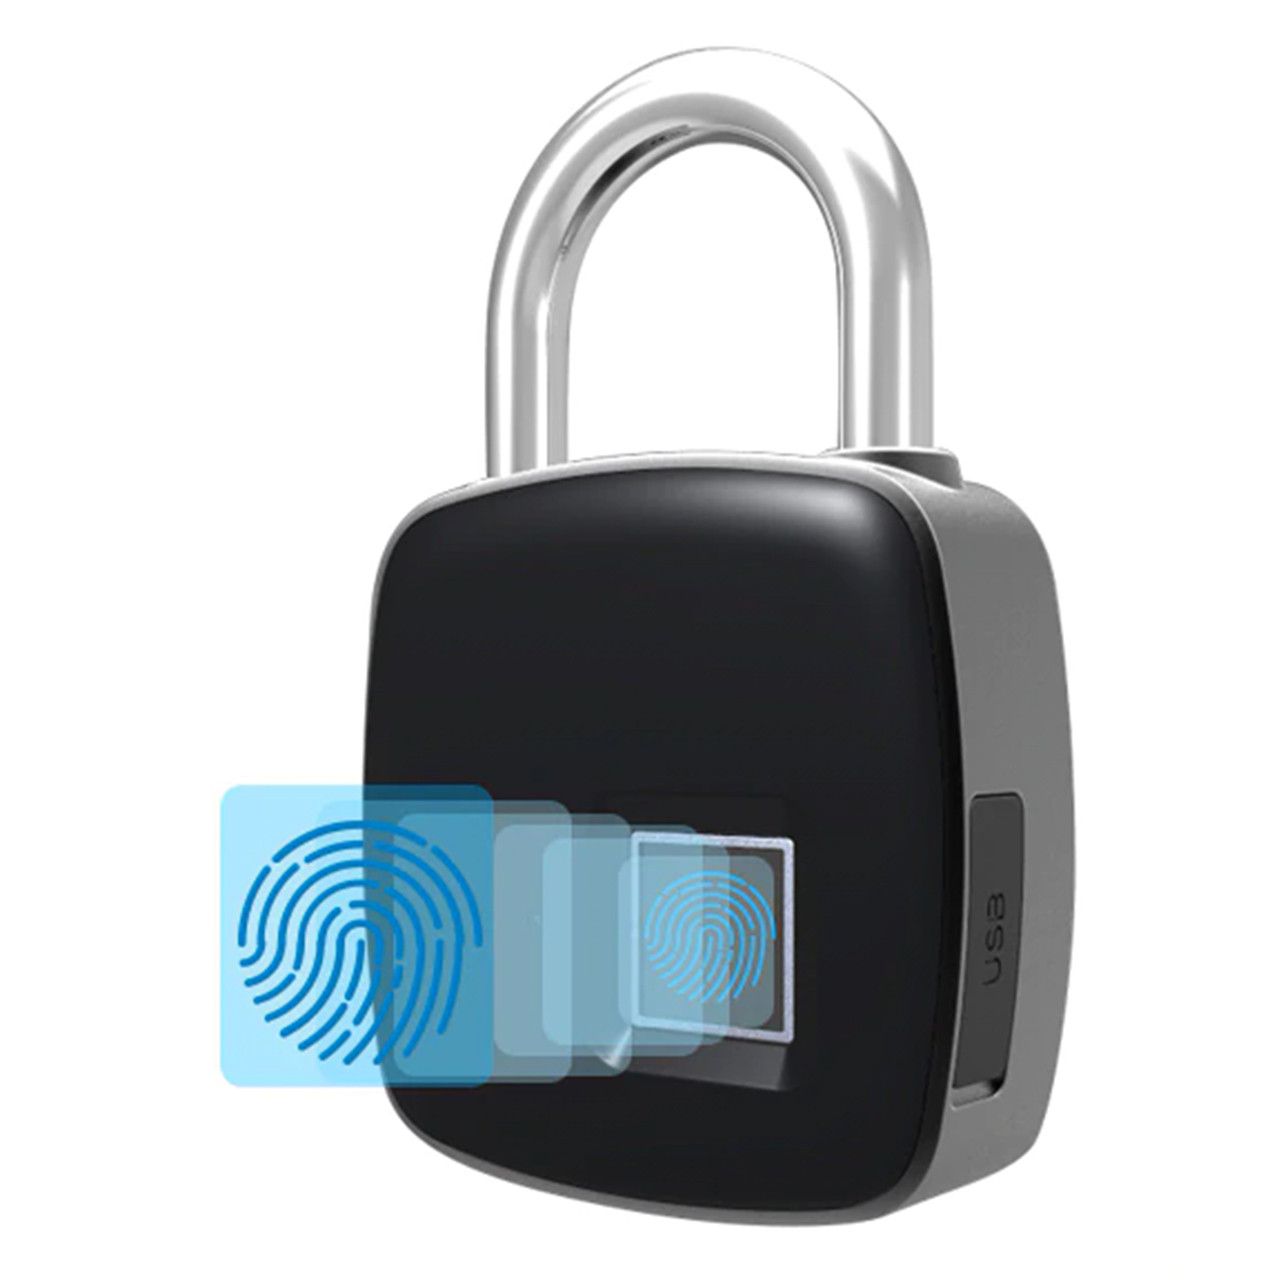 Умный замок Anytek P3+ с отпечатком пальца навесной интелектуальный Bl